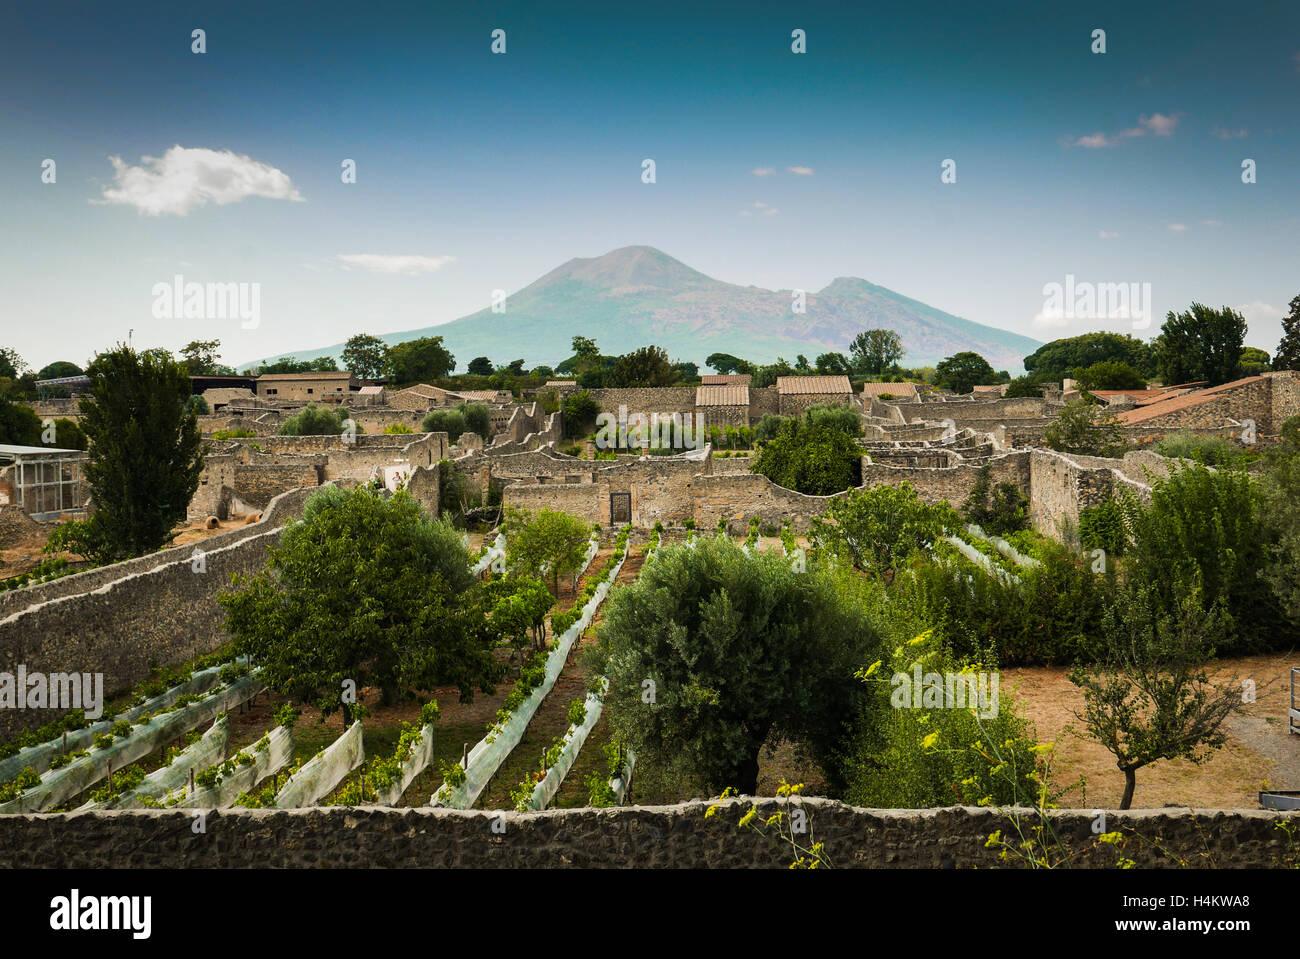 Pompeii, Italy - Ruins of the forum with Vesuvius - Stock Image